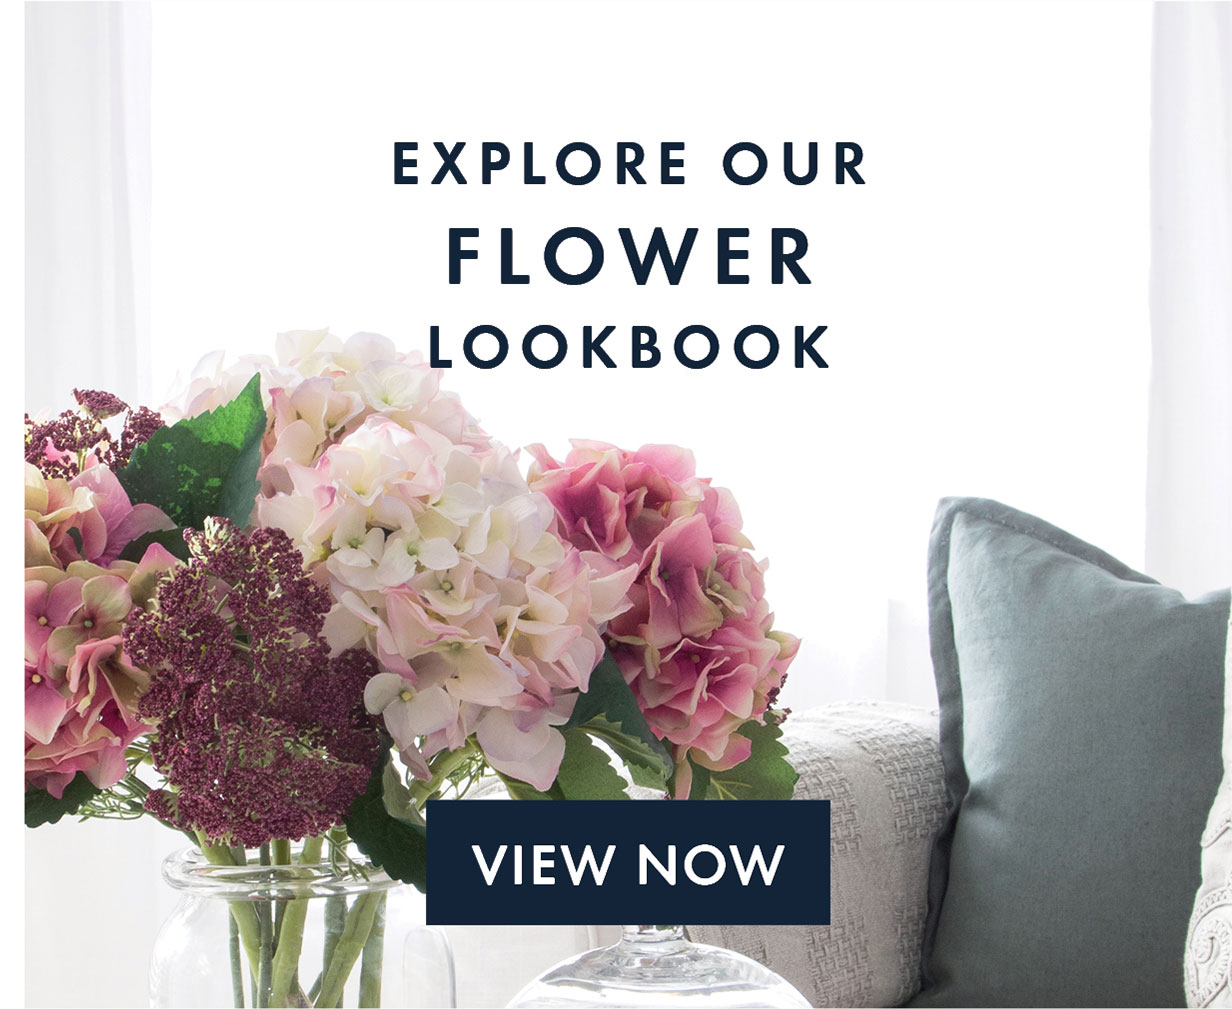 Explore Our Flower Lookbook